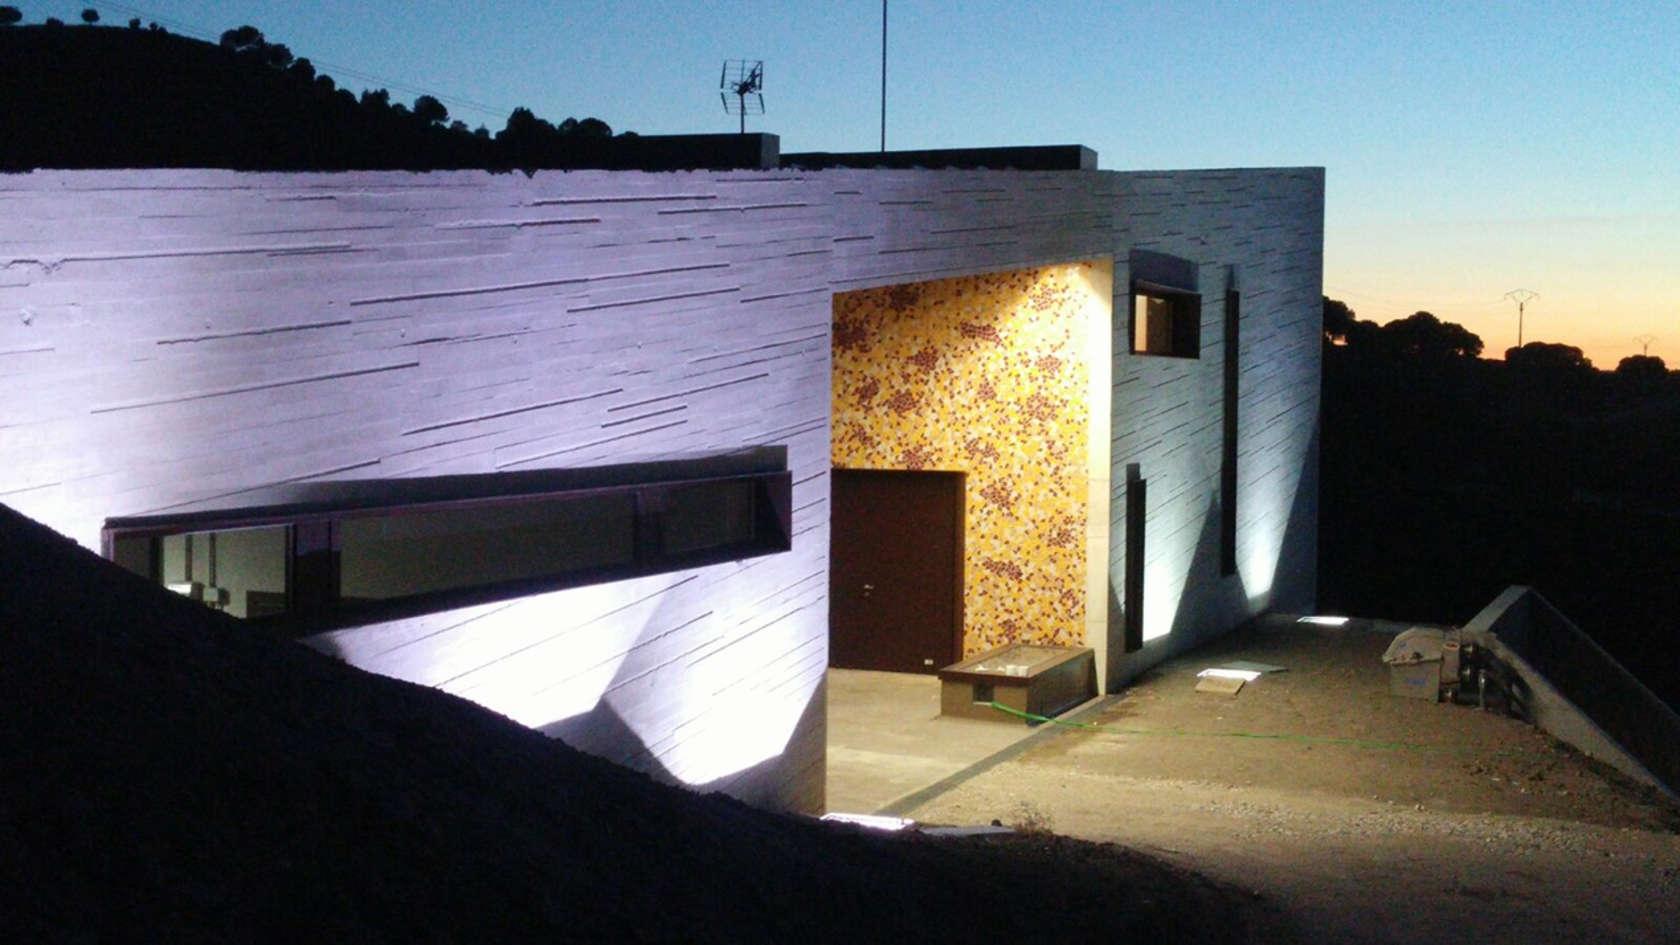 Bodega Valdemonjas Premios arquitectura Ana Agag Silvia Paredes2 1680x945 c